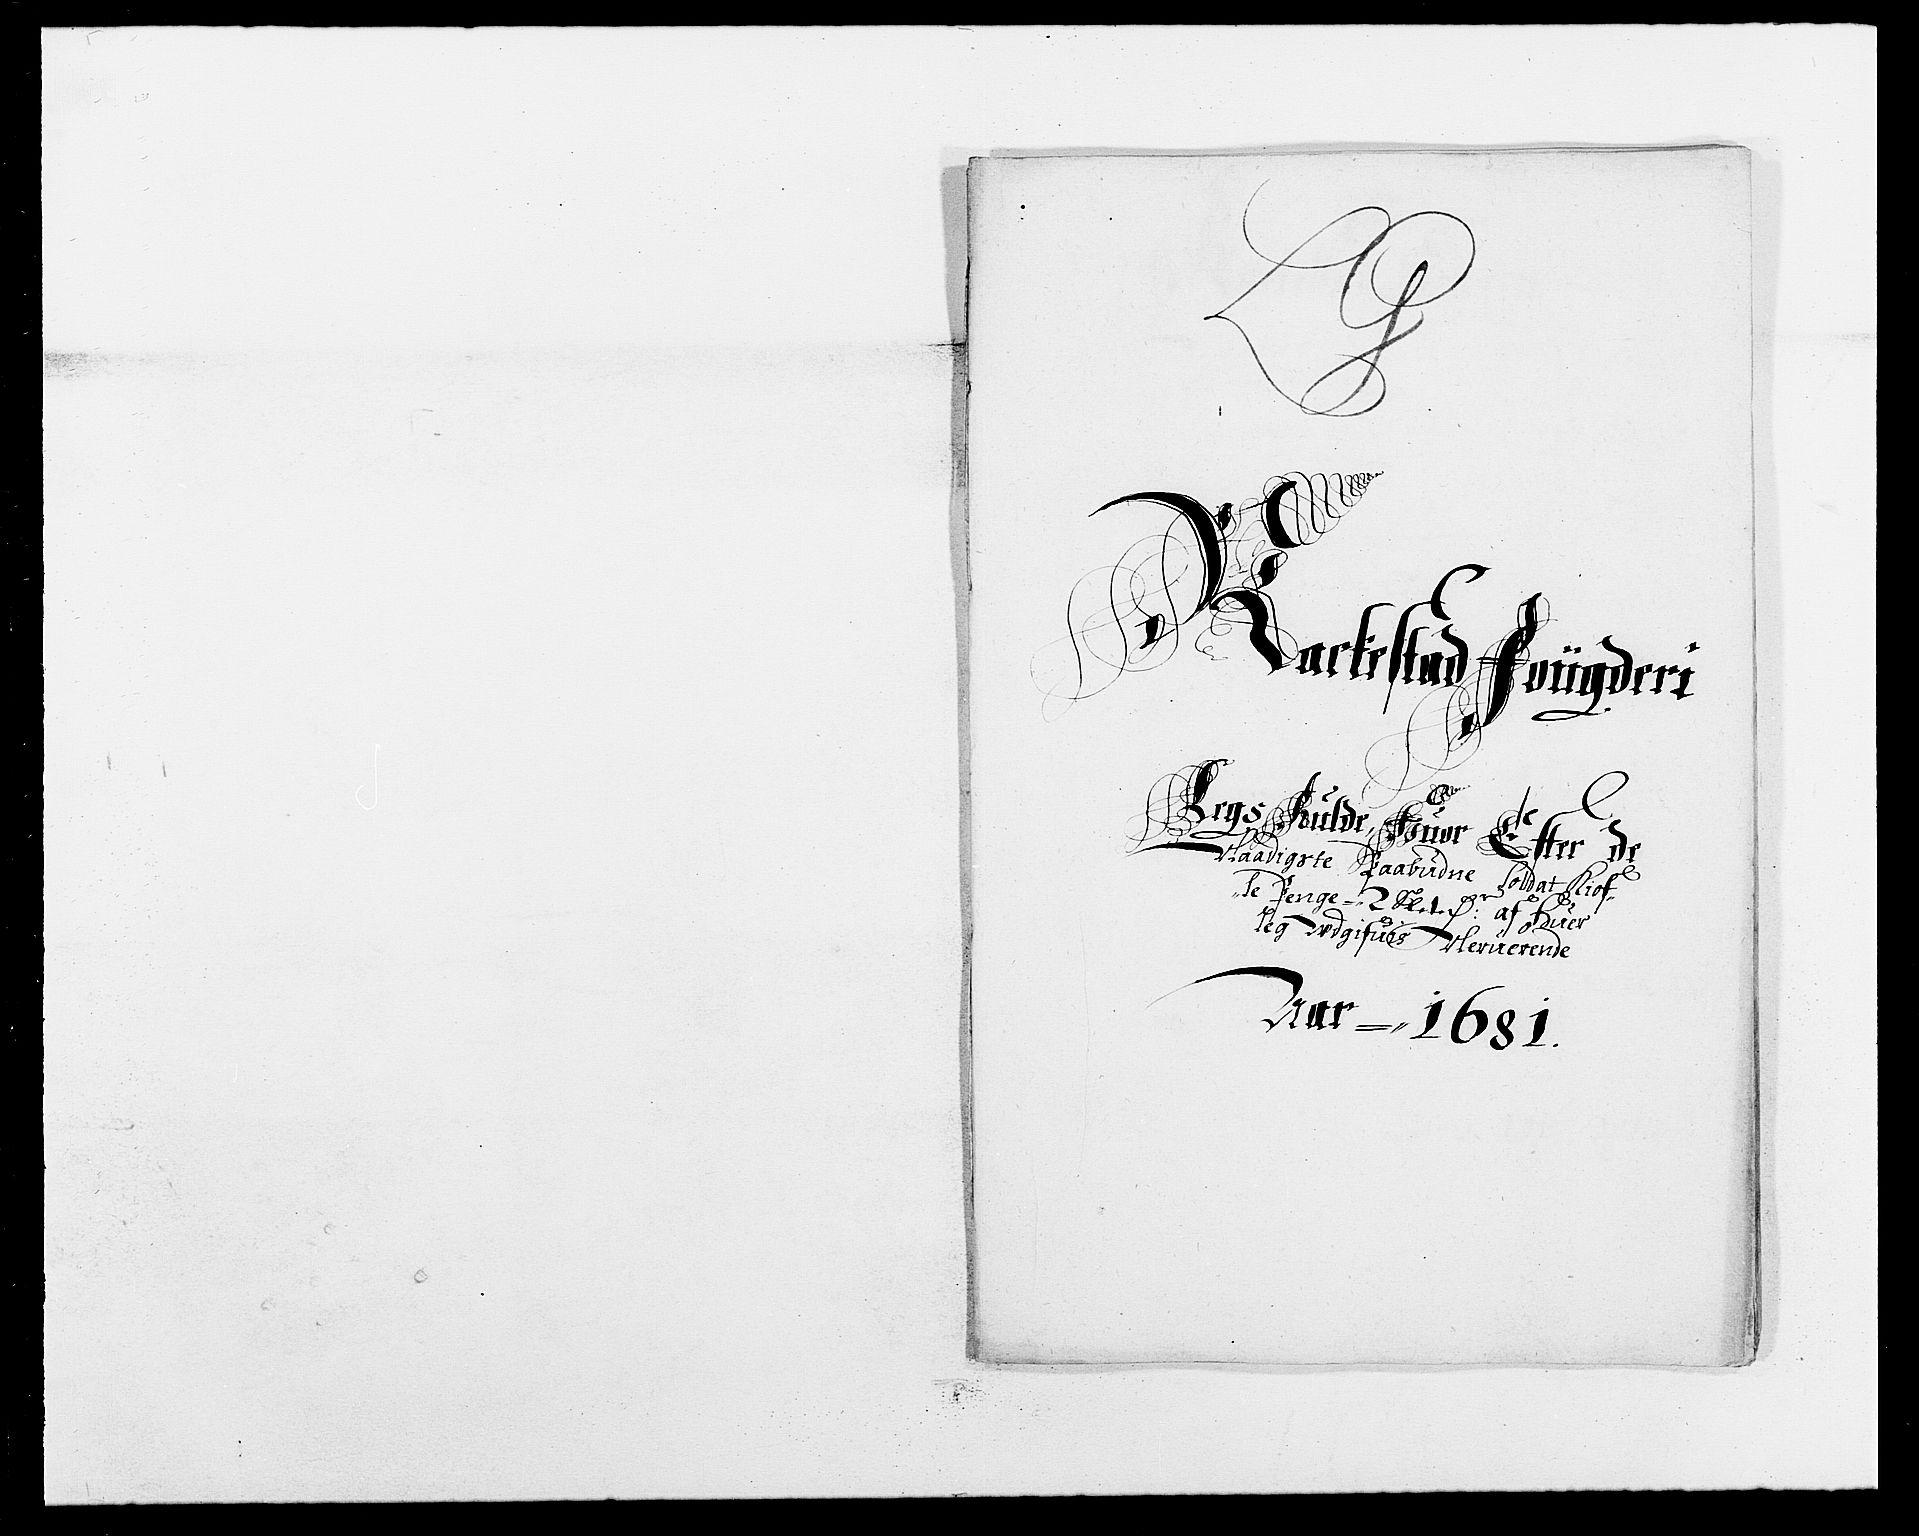 RA, Rentekammeret inntil 1814, Reviderte regnskaper, Fogderegnskap, R05/L0272: Fogderegnskap Rakkestad, 1680-1681, s. 361